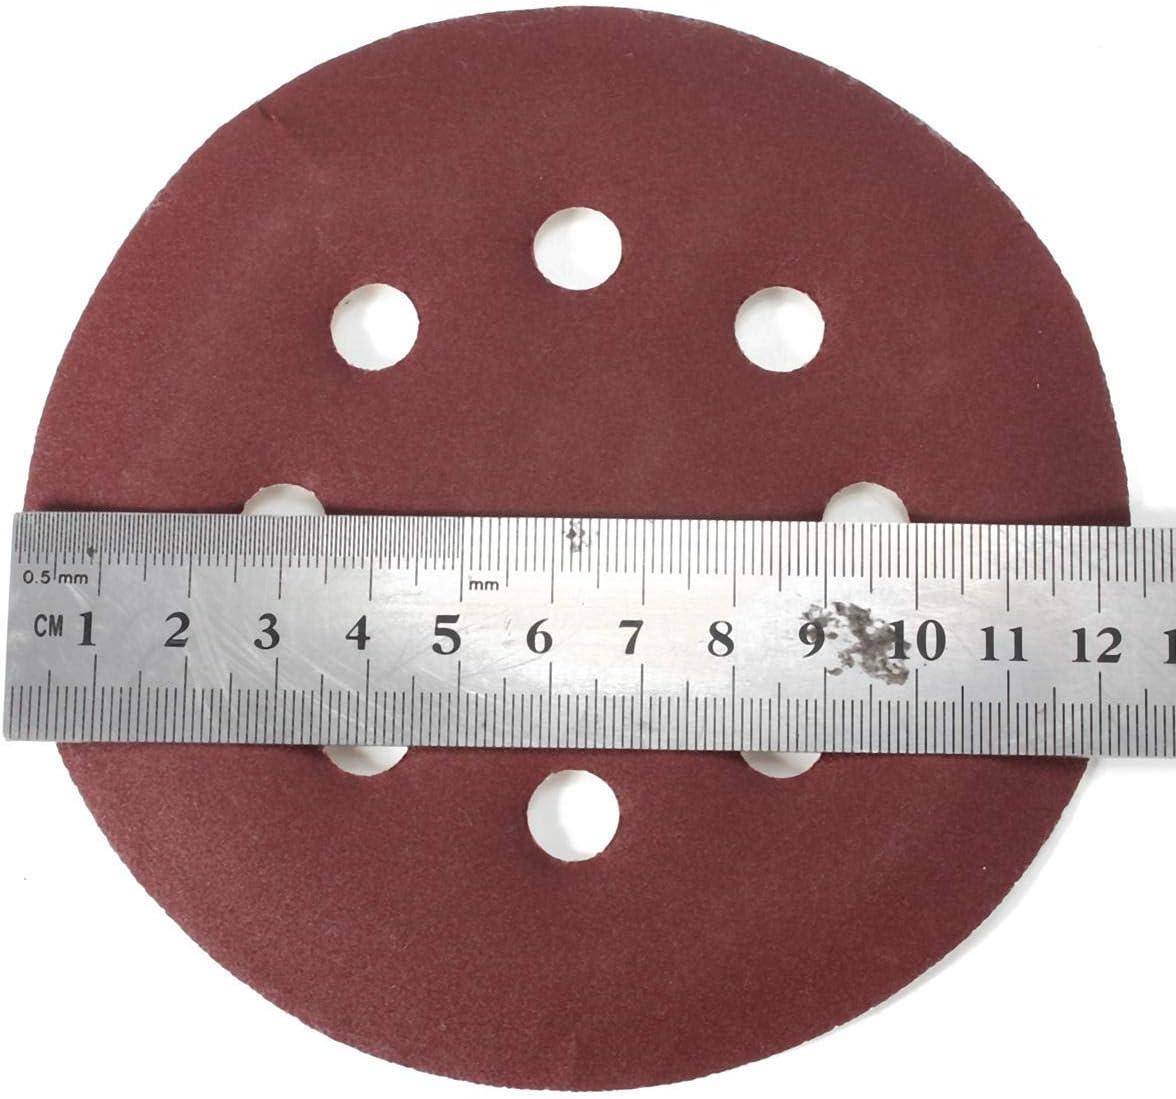 CHUNSHENN 25pcs 400 Grit 5 Incch Sanding Disc Set 8 Holes Abrasive Polishing Sandpaper Sand Sheets Grinding and Polishing Abrasive Accessories